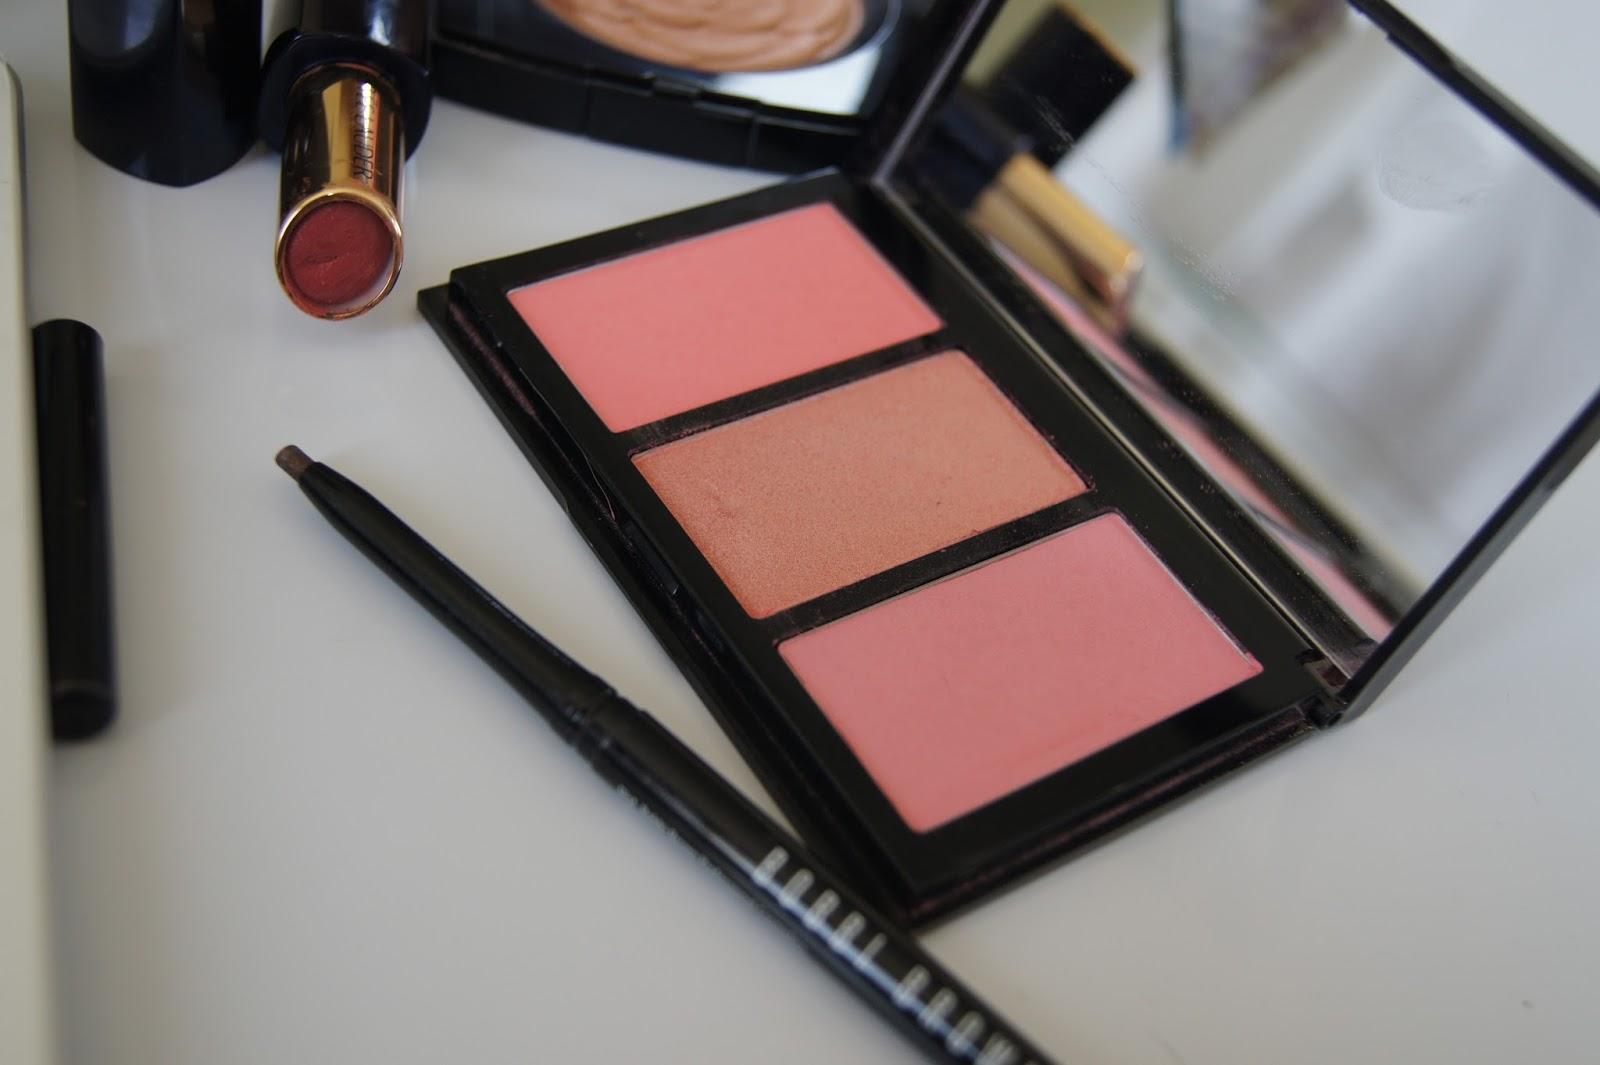 Bobbi Brown Calypso blush palette